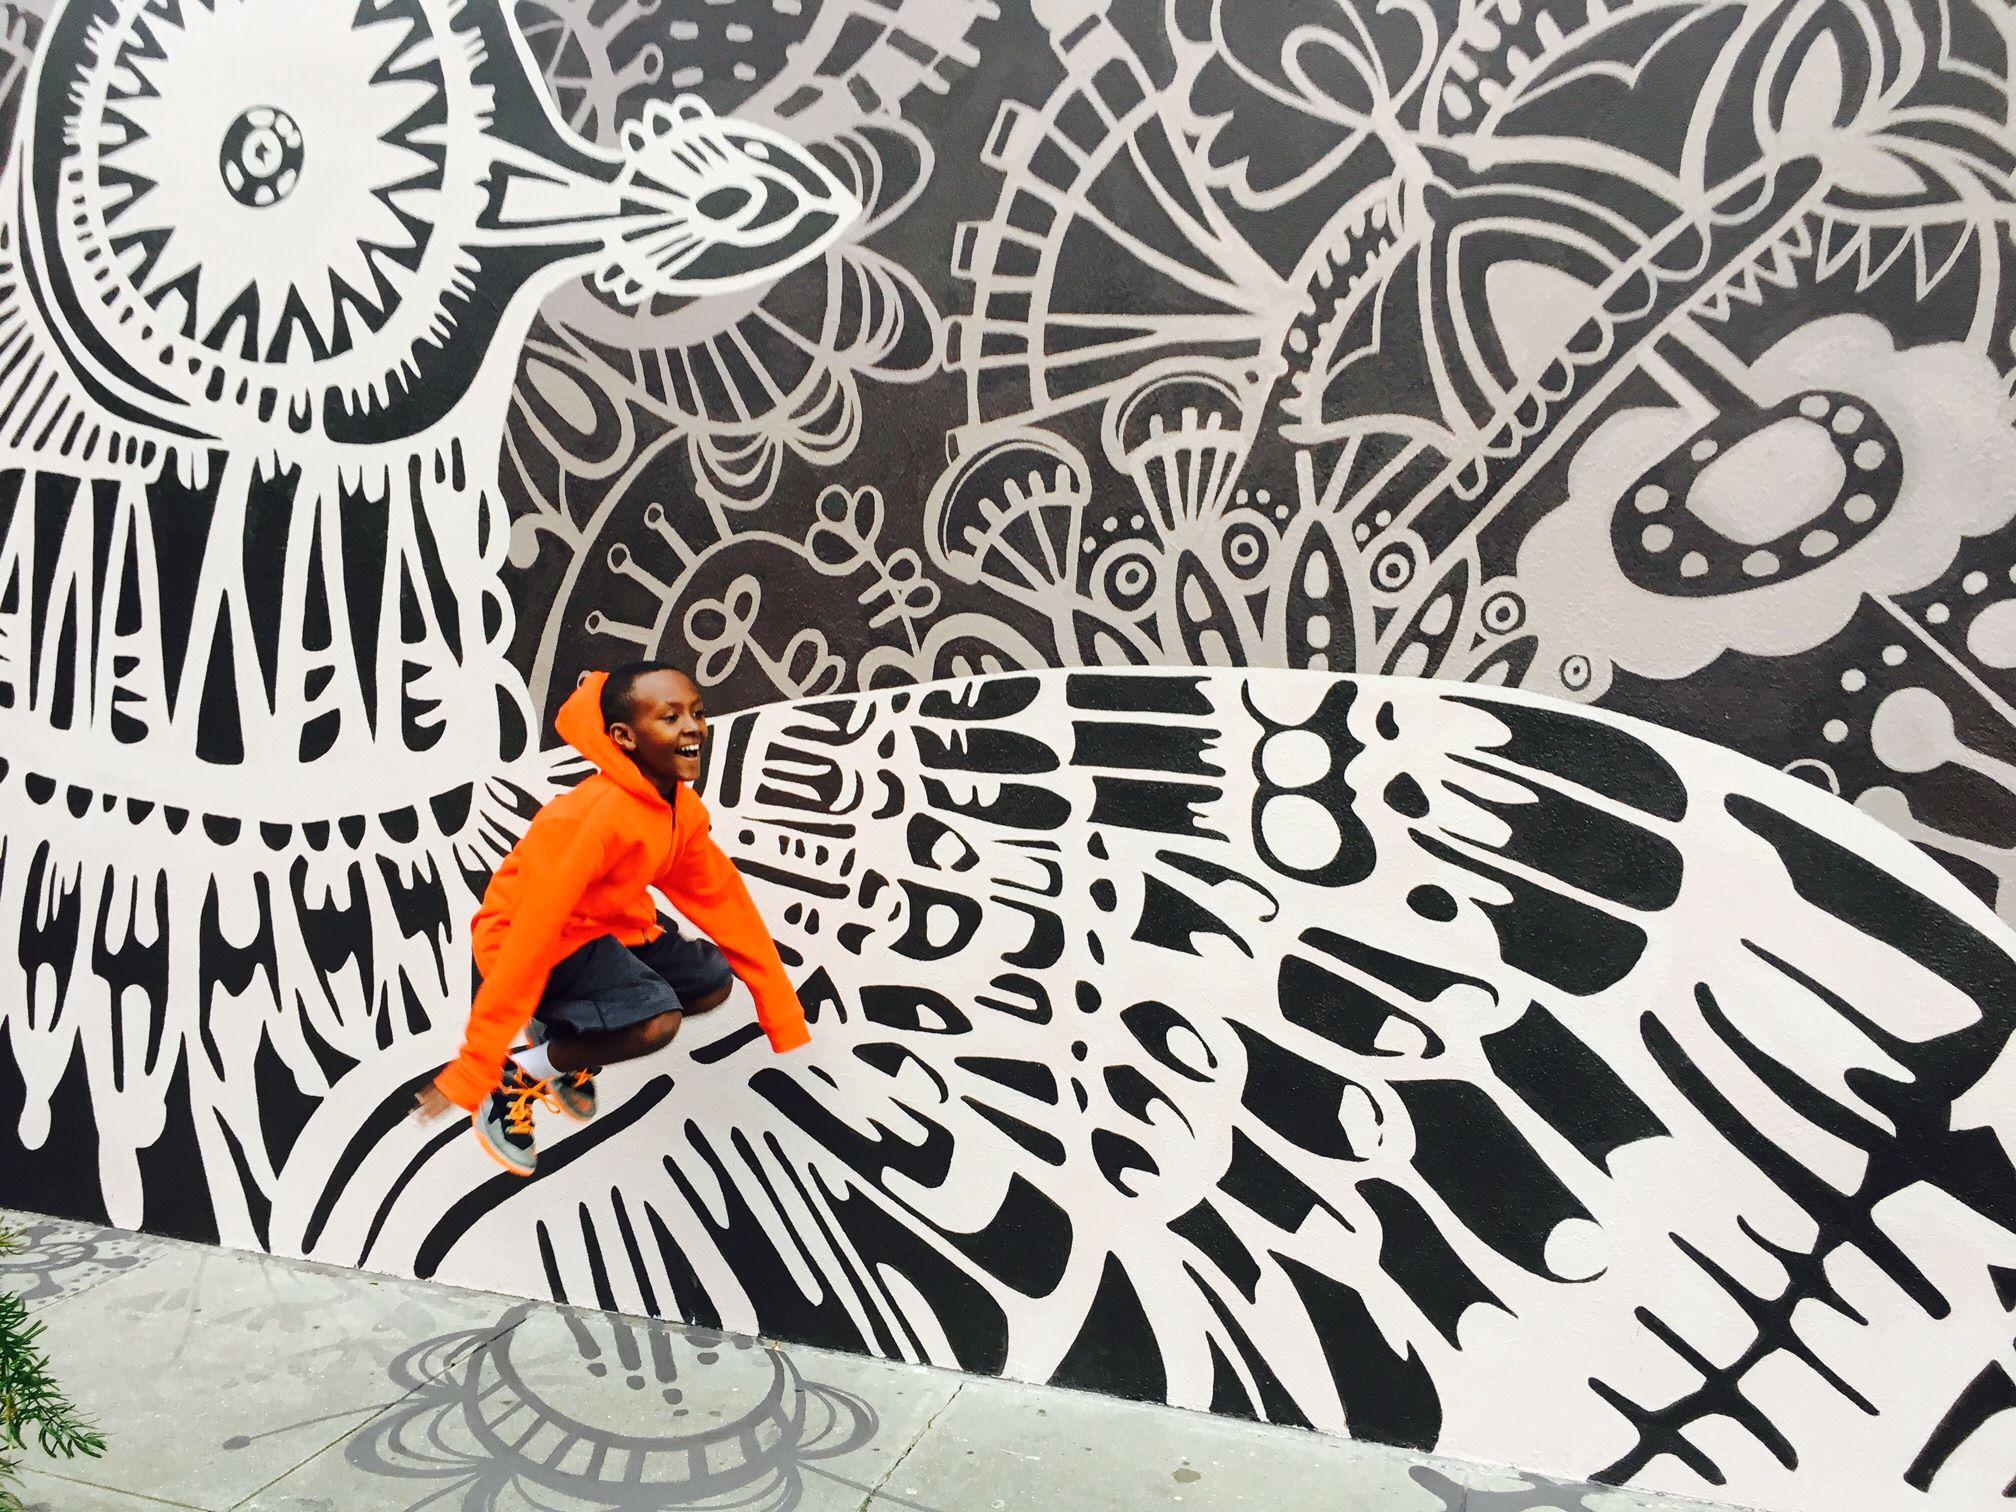 Mural, San Francisco 2017